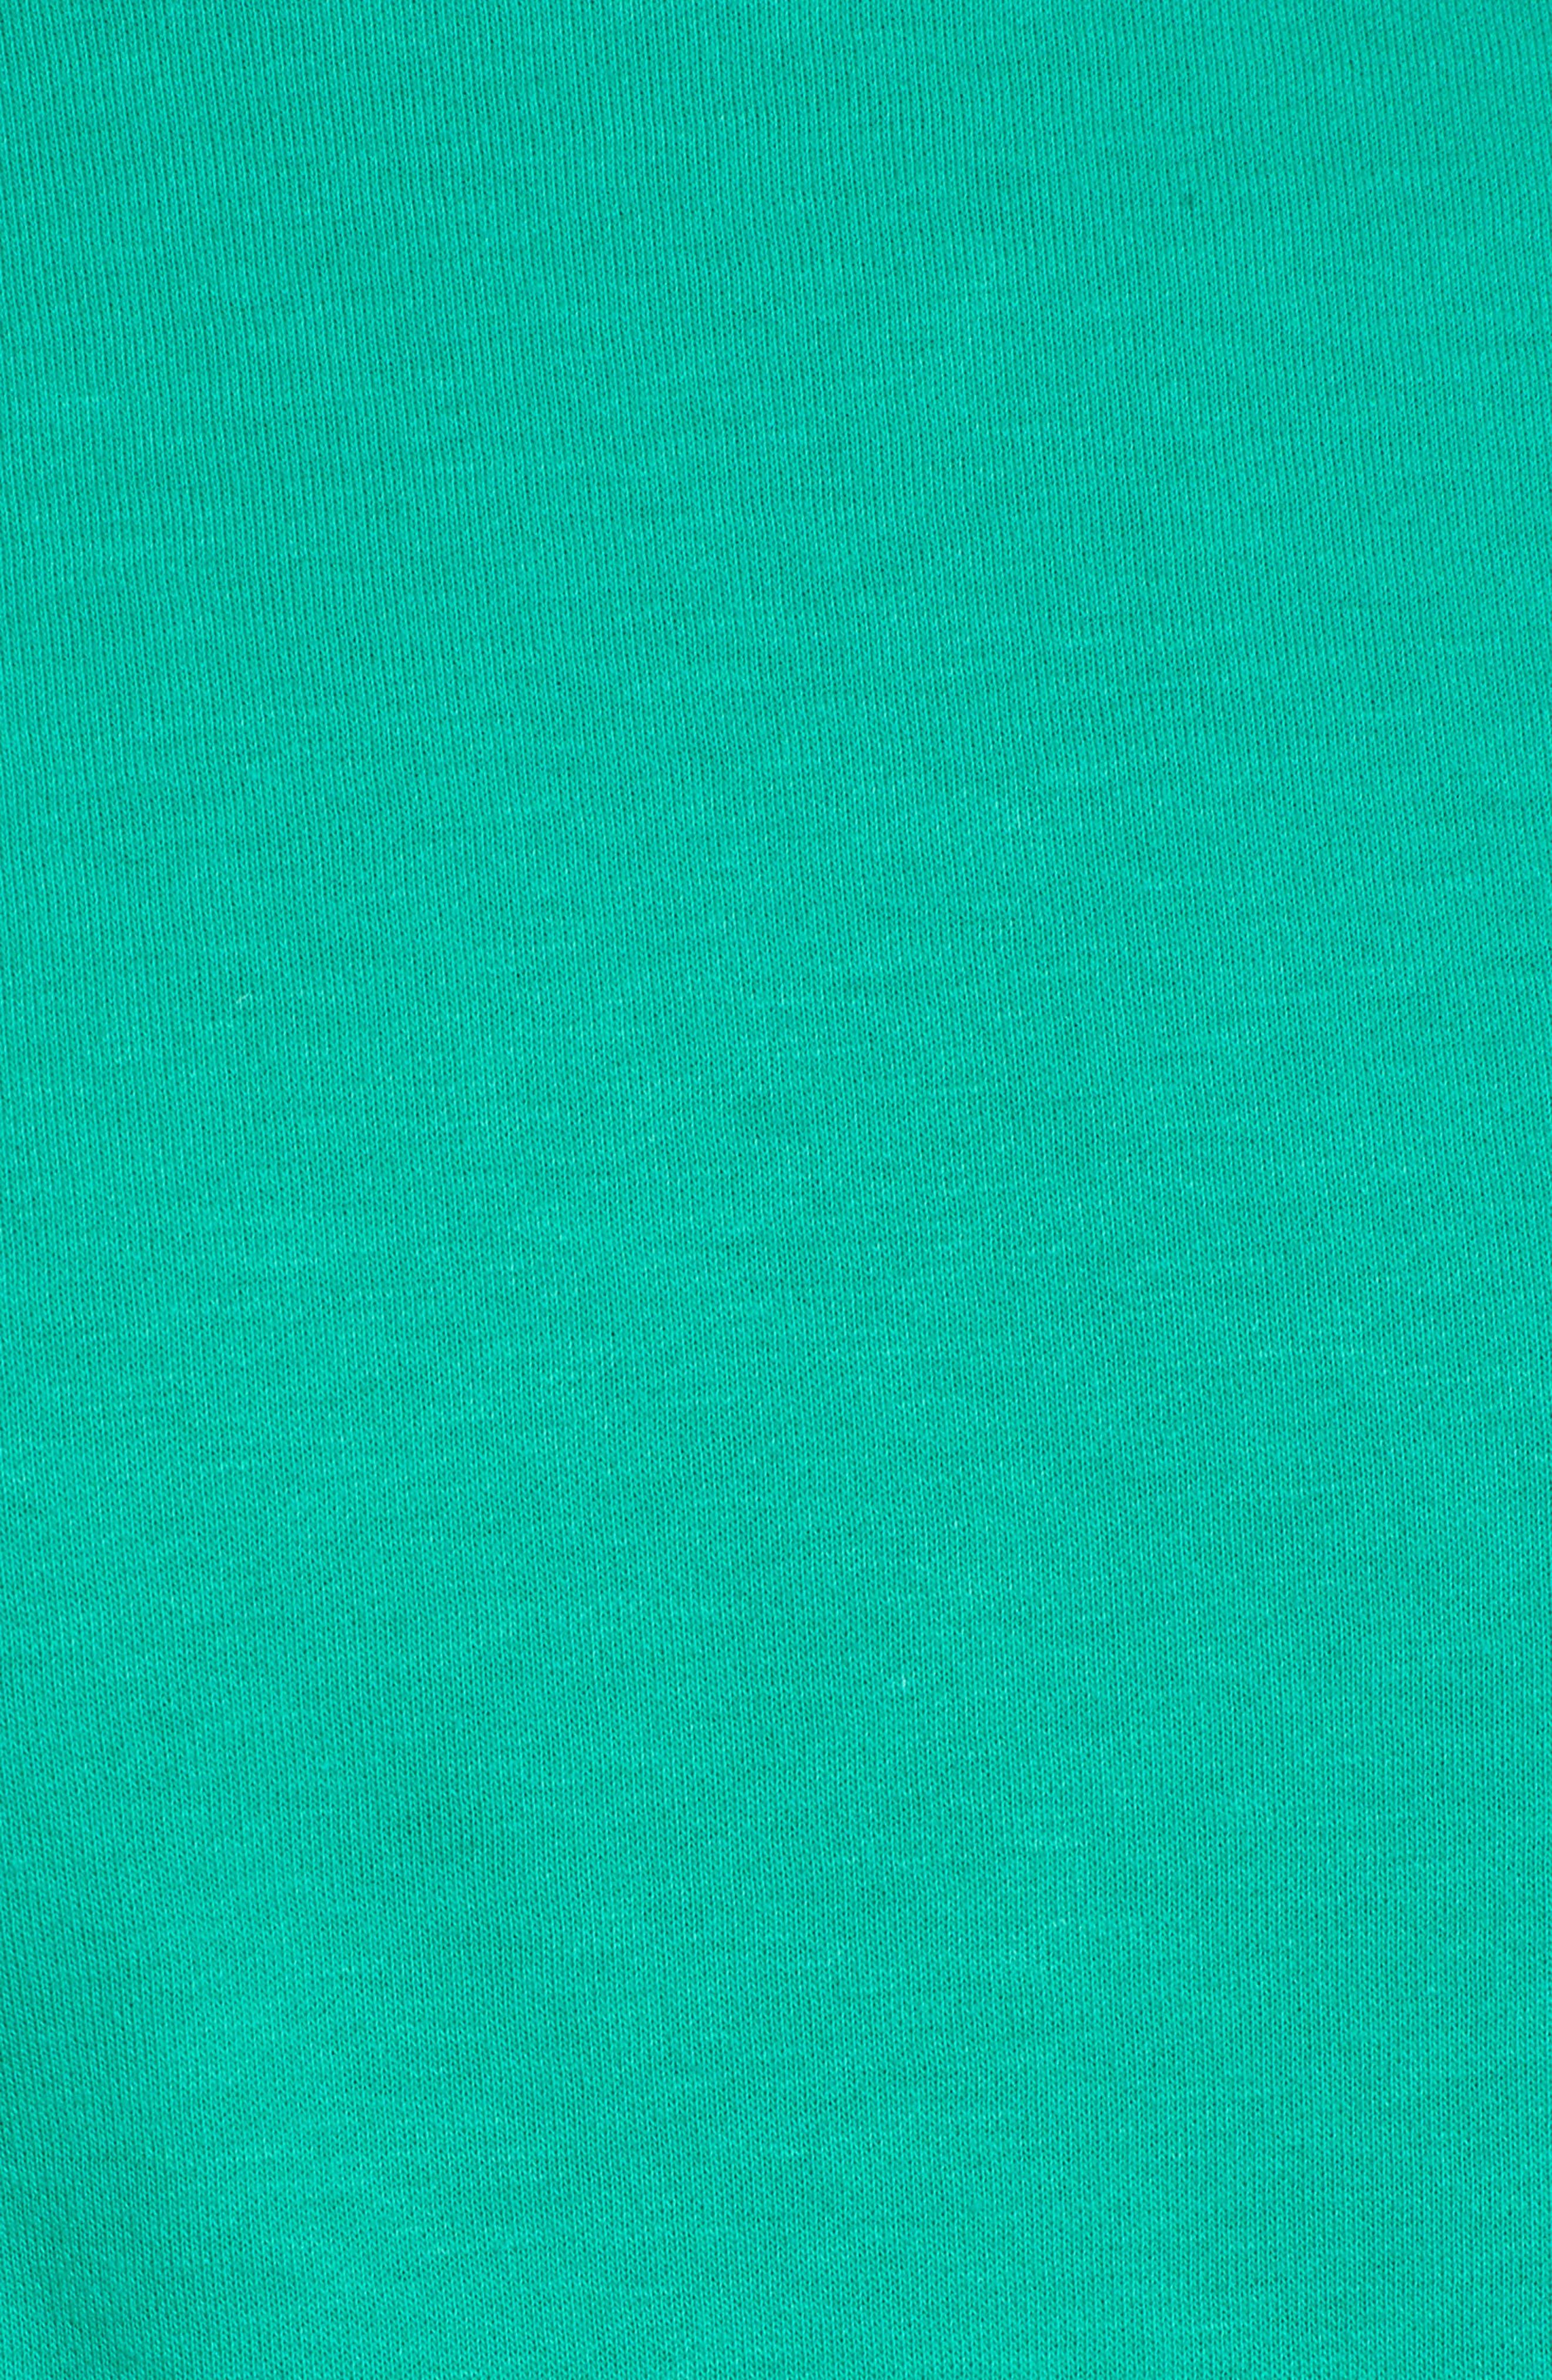 Blouson Sleeve Sweatshirt,                             Alternate thumbnail 23, color,